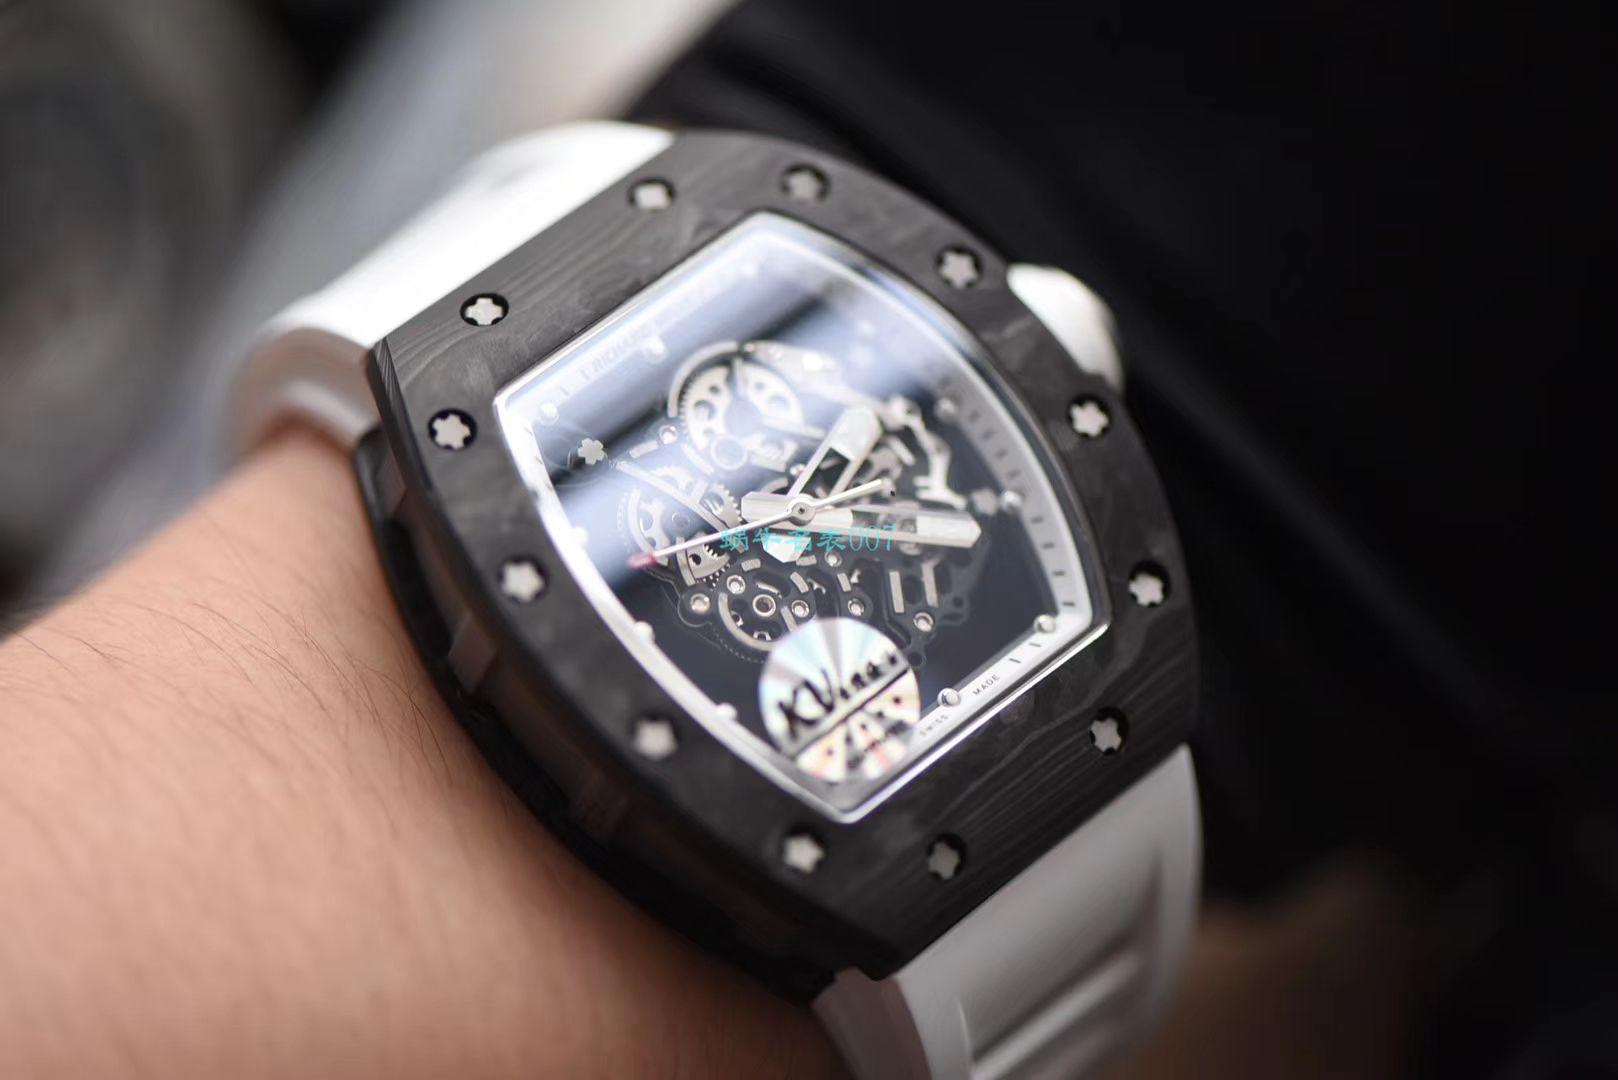 KV厂顶级复刻RICHARD MILLE理查德米勒RM 055腕表 / KVRM0551